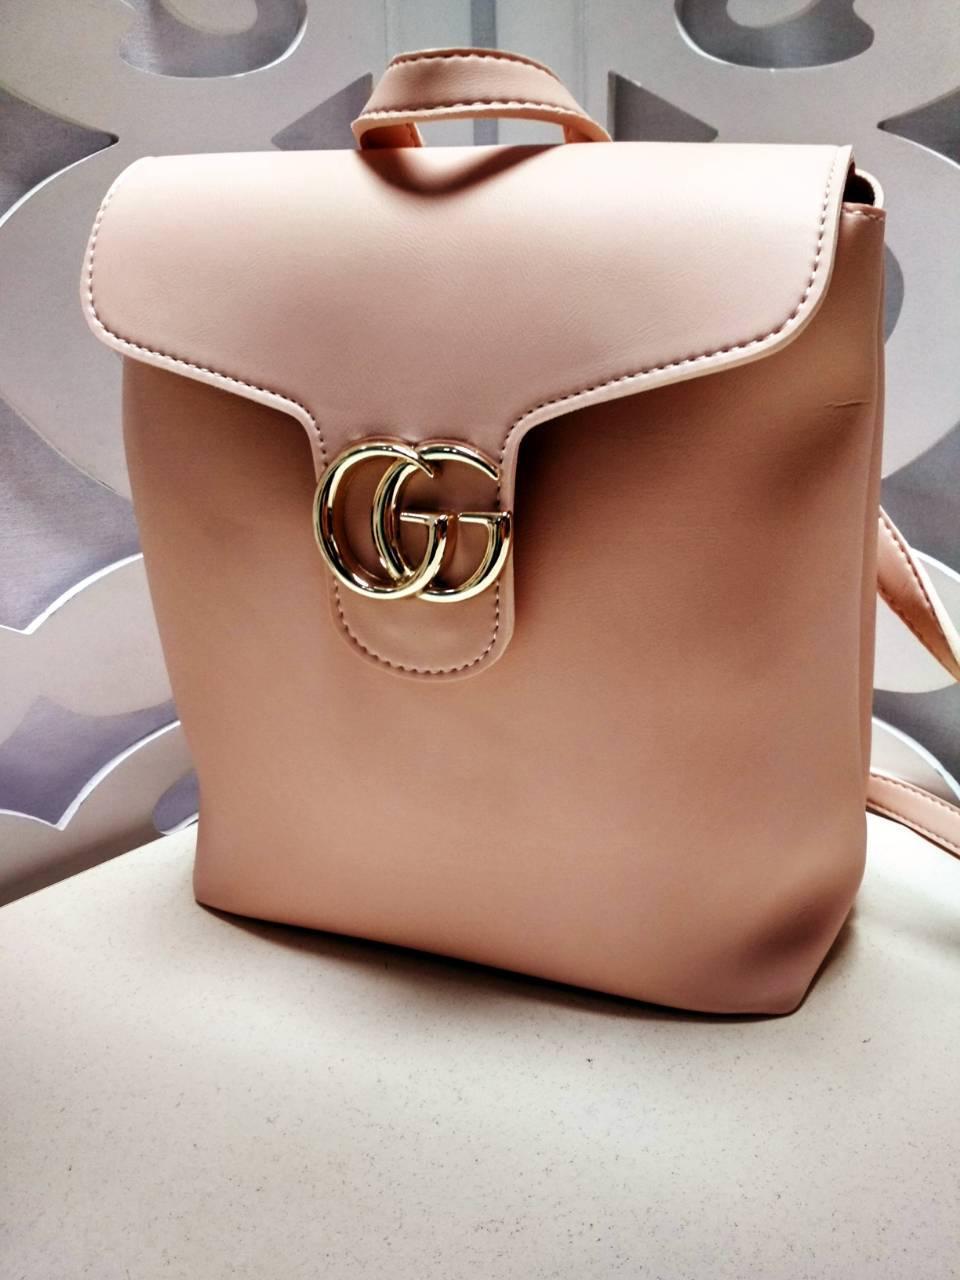 Рюкзак-сумка женский(классика бренд).